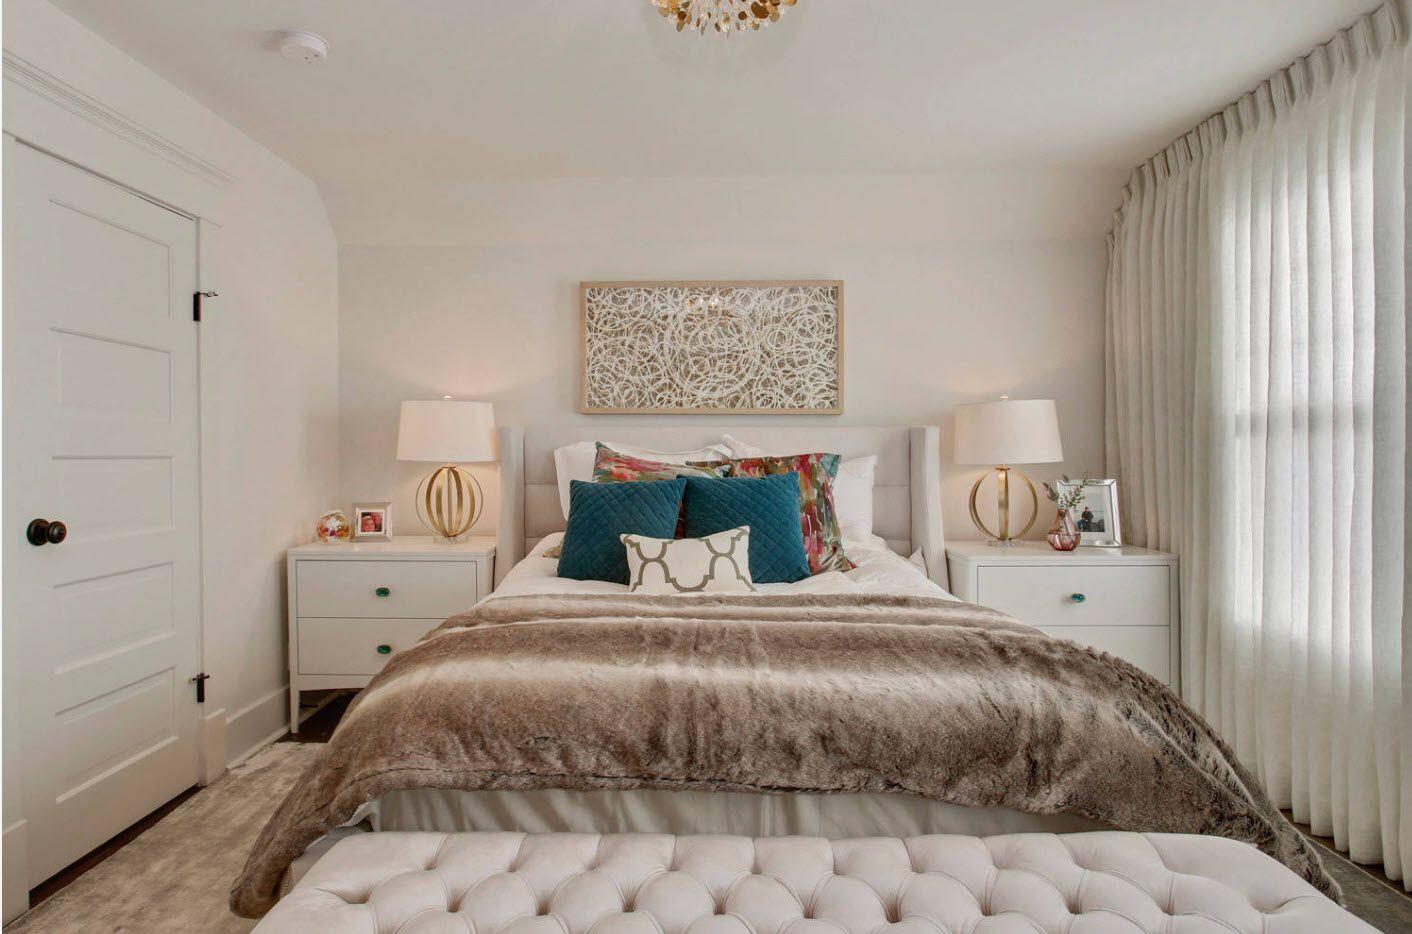 Modern Bedroom Interior Decoration & Design Ideas 2017. Quilted ottoman